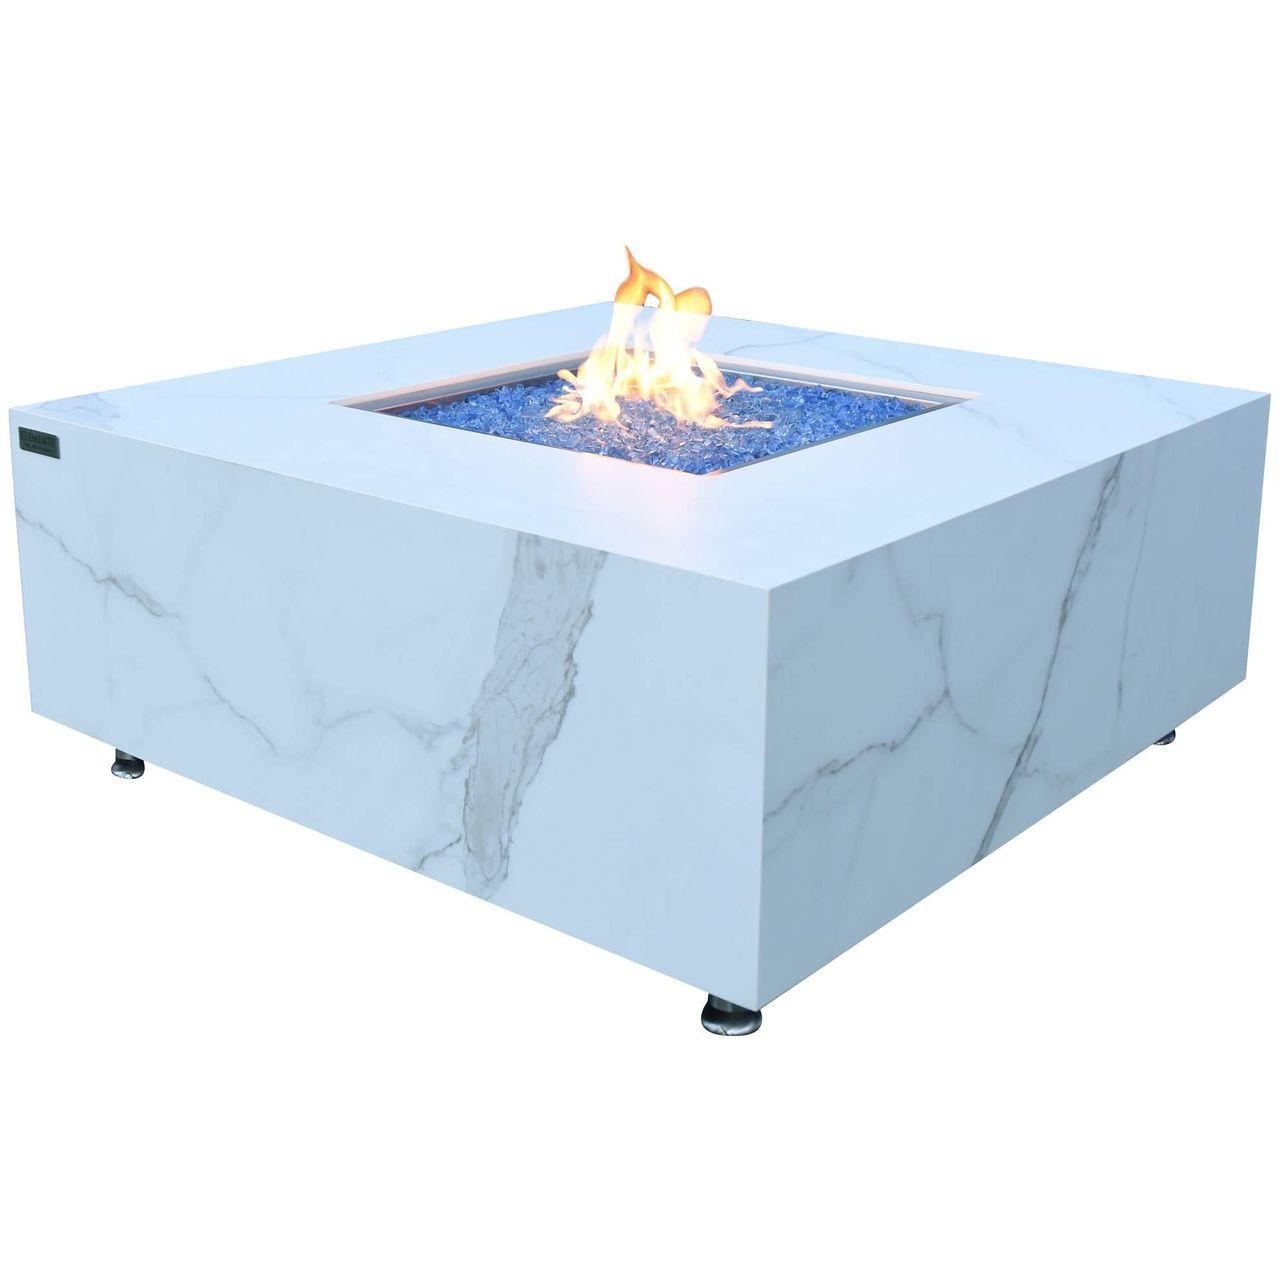 Elementi OFP103BW-LP Bianco Marble Porcelain Fire Table - Propane